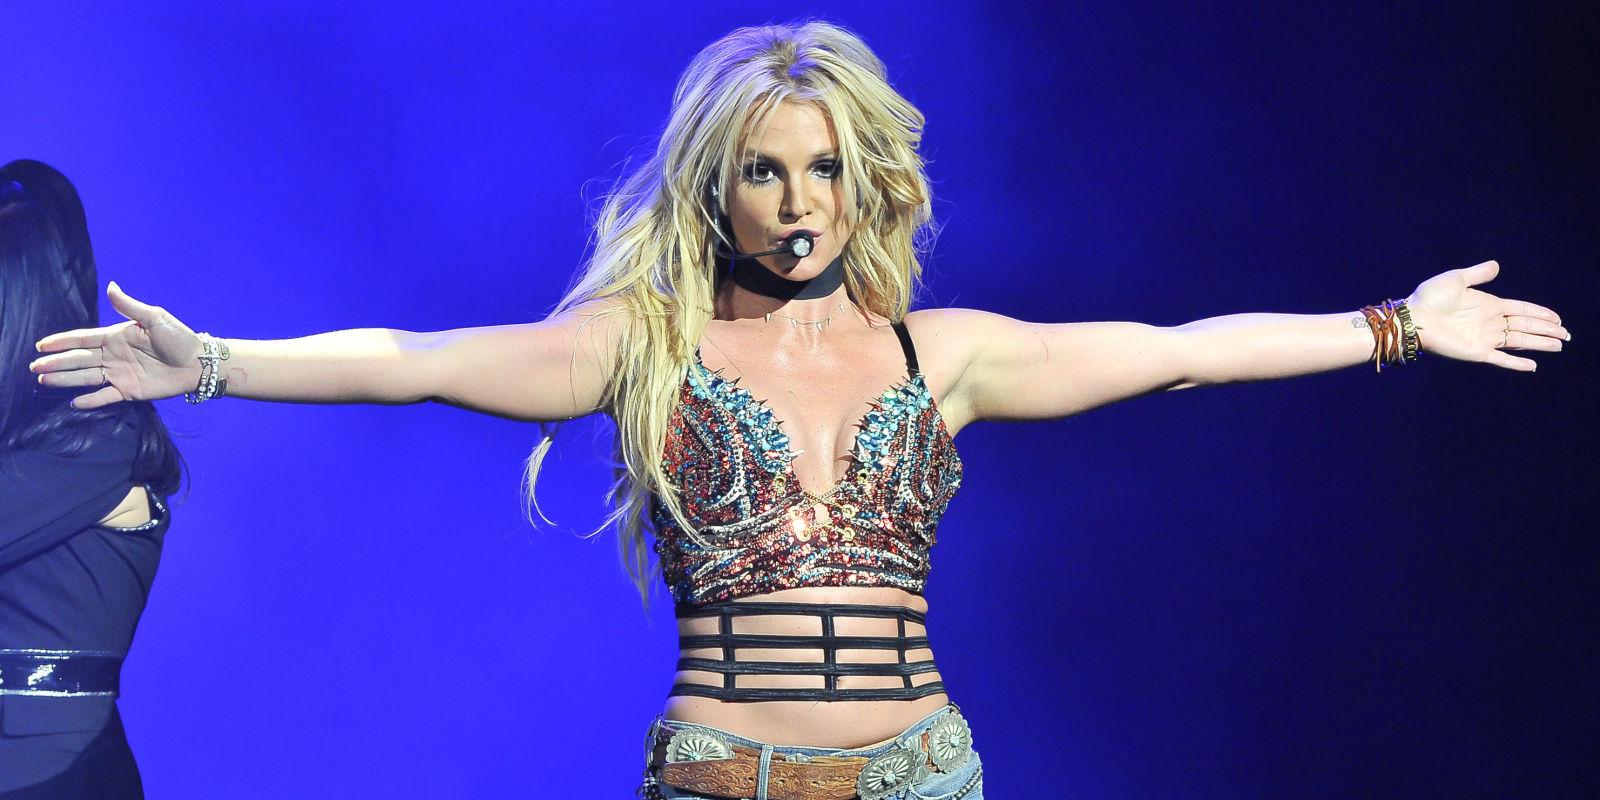 PSA: Britney Spears Is Still Very Much Alive